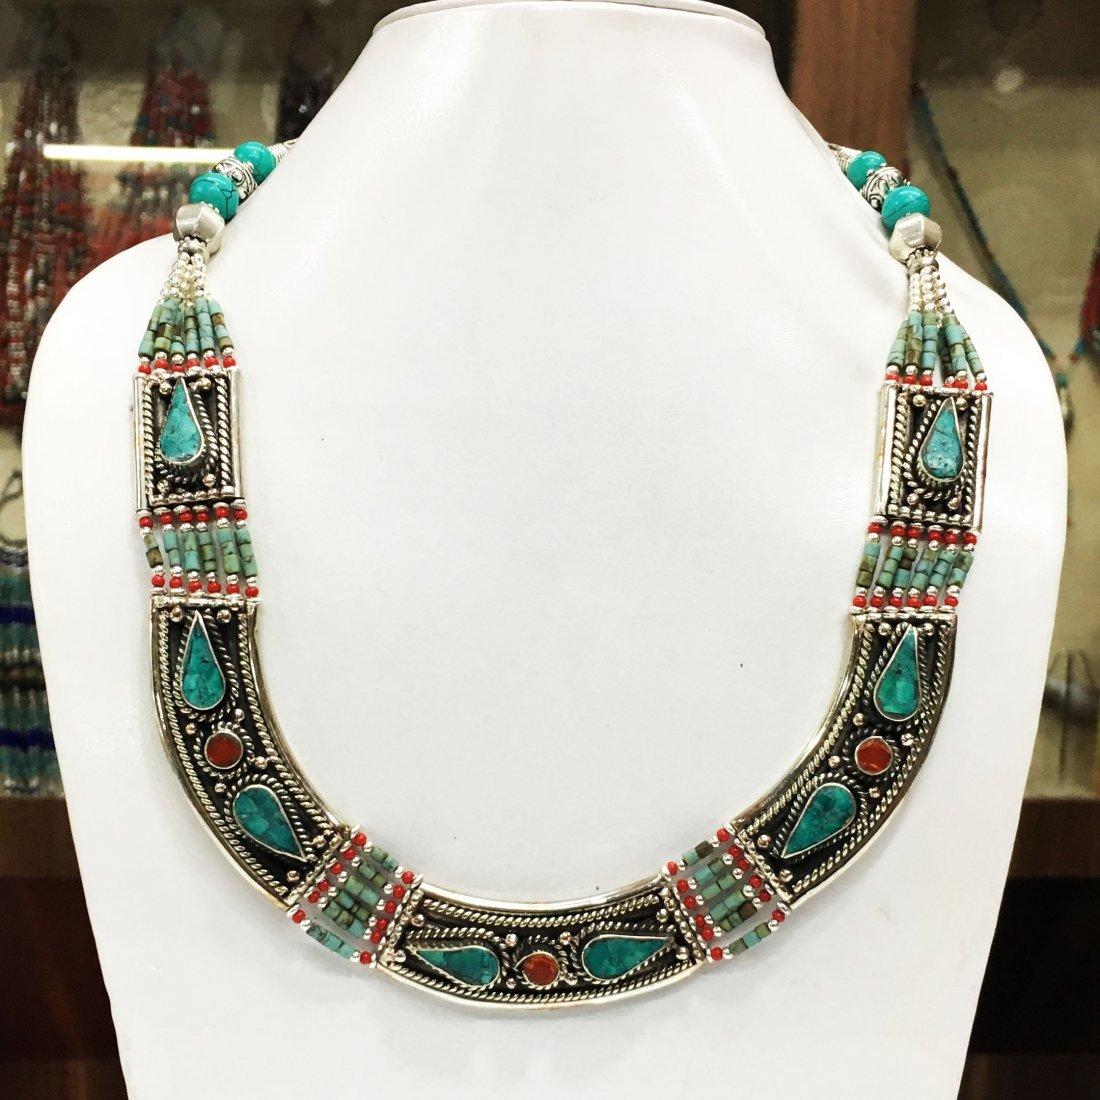 Vintage Turquoise & Coral Tibetan Handmade Necklace